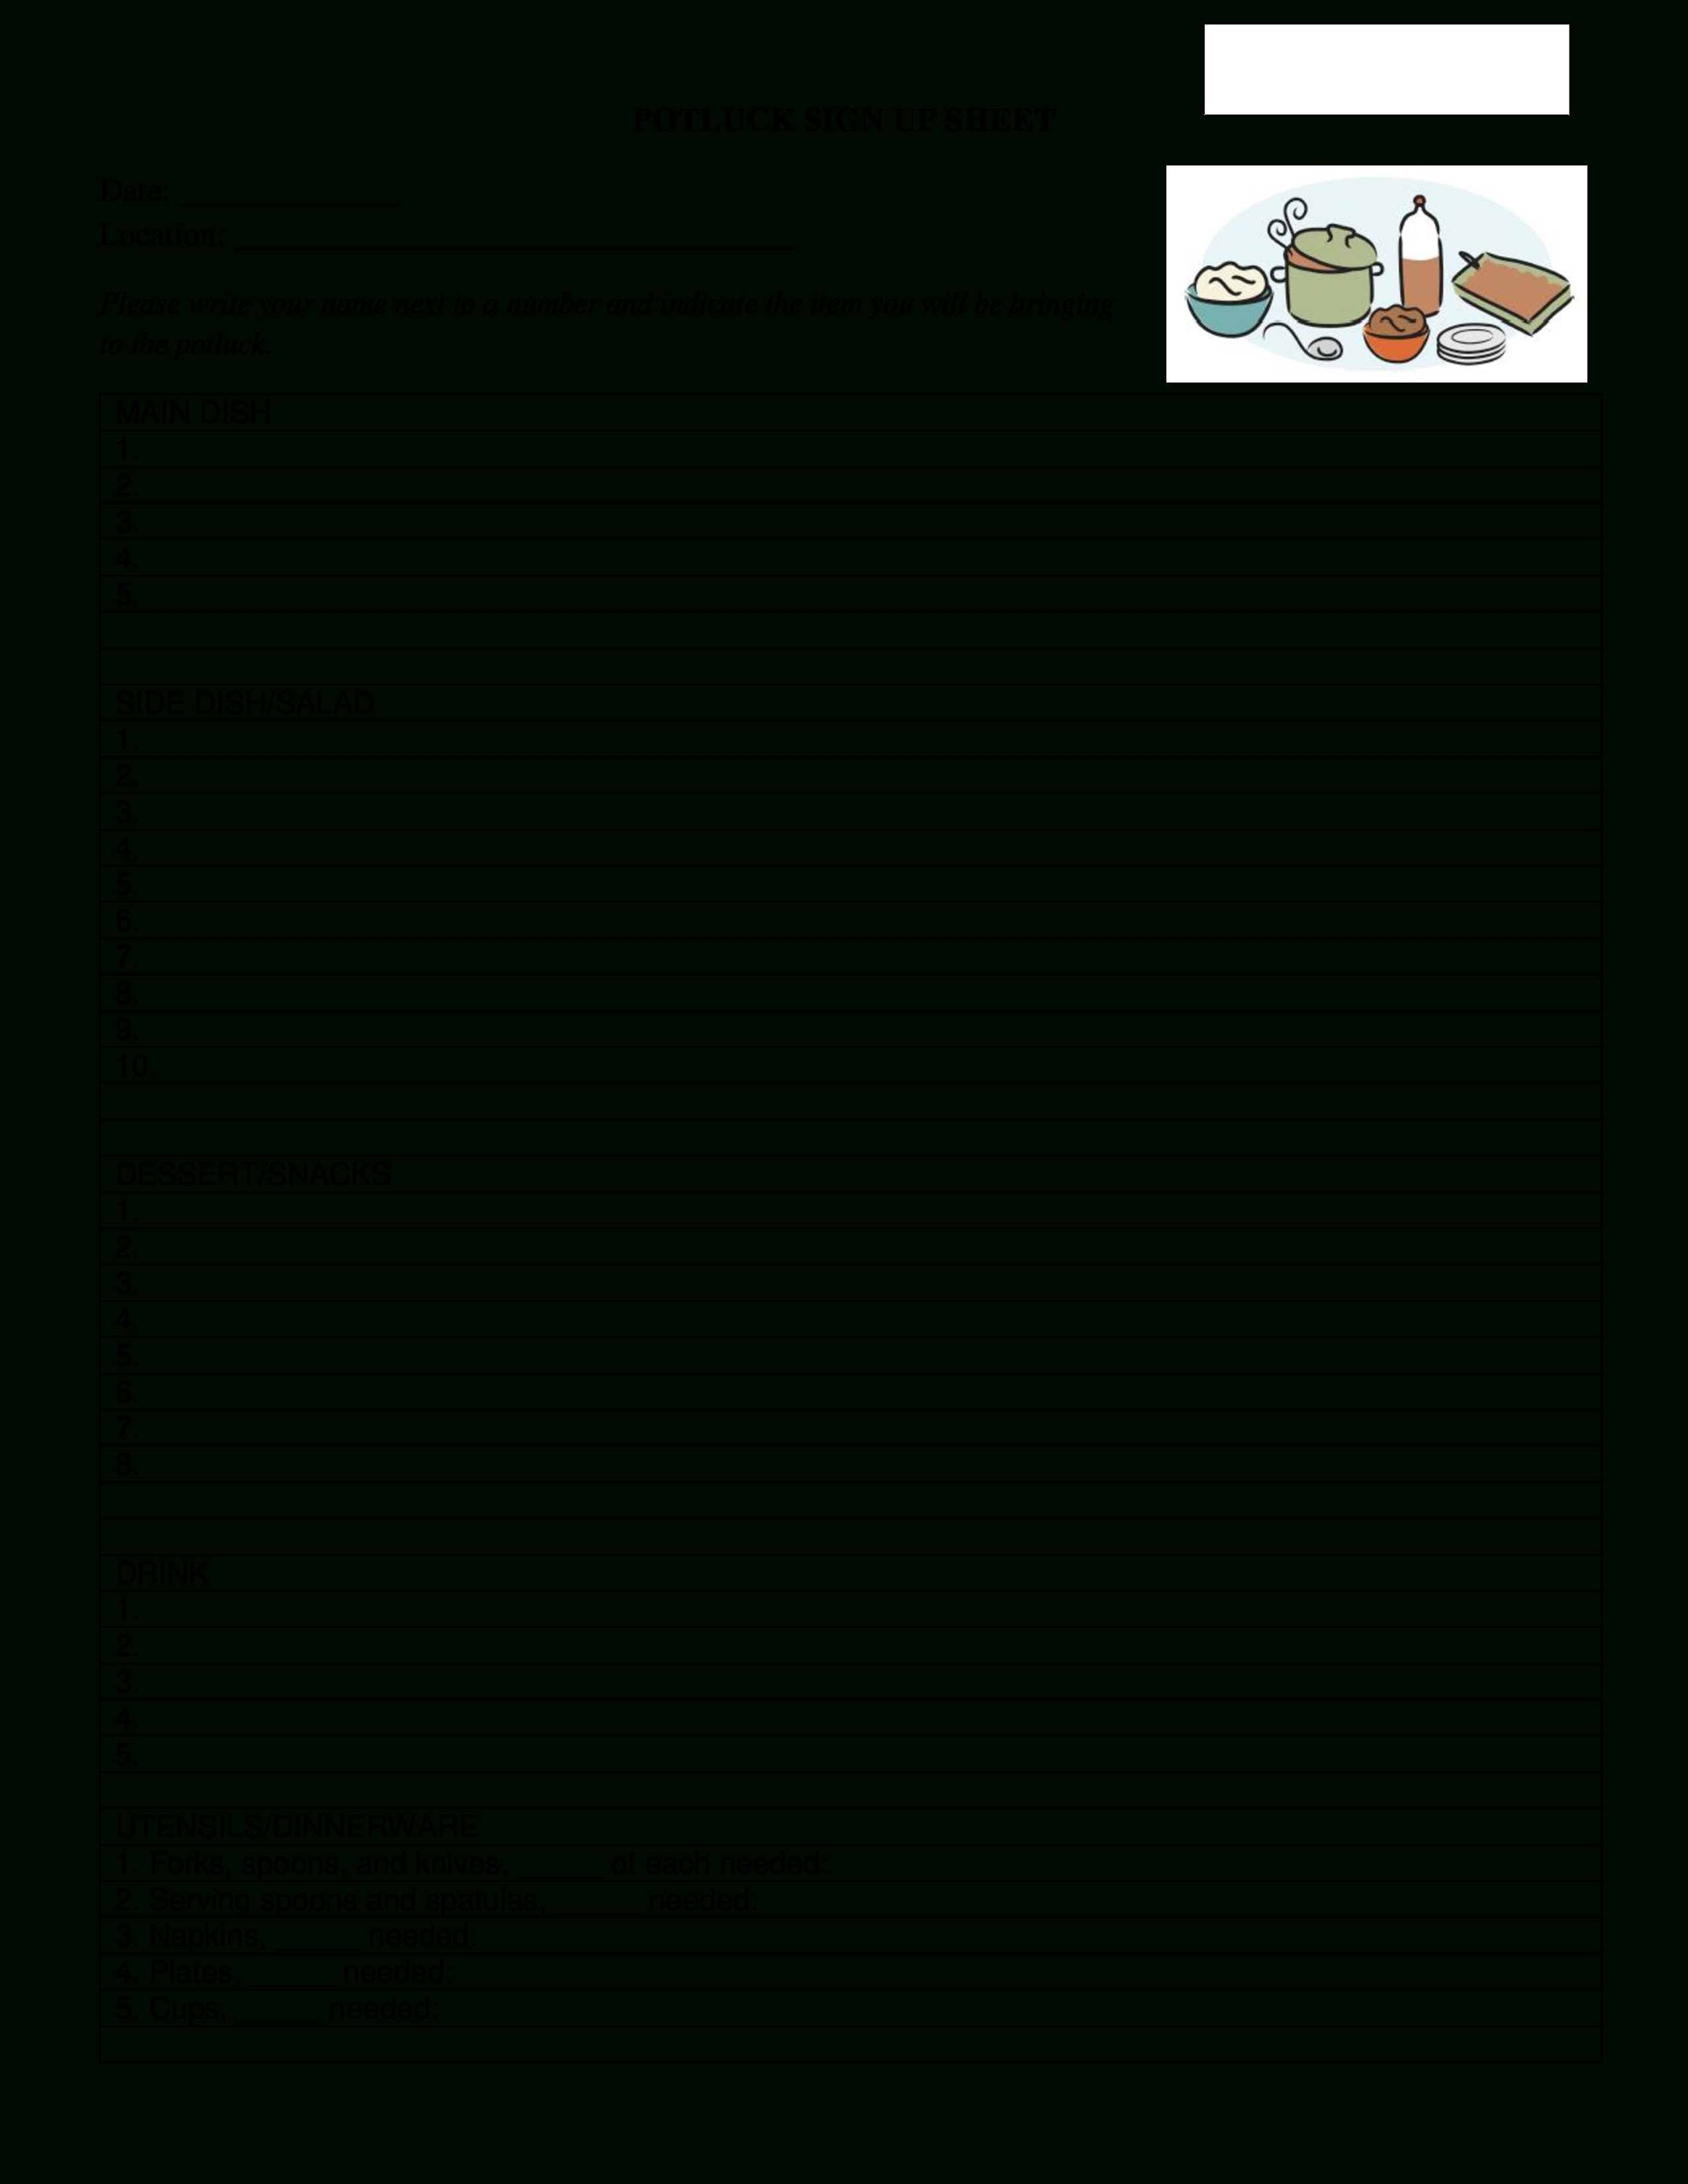 Free Potluck Signup Sheet   Templates At Allbusinesstemplates - Free Printable Sign Up Sheets For Potlucks